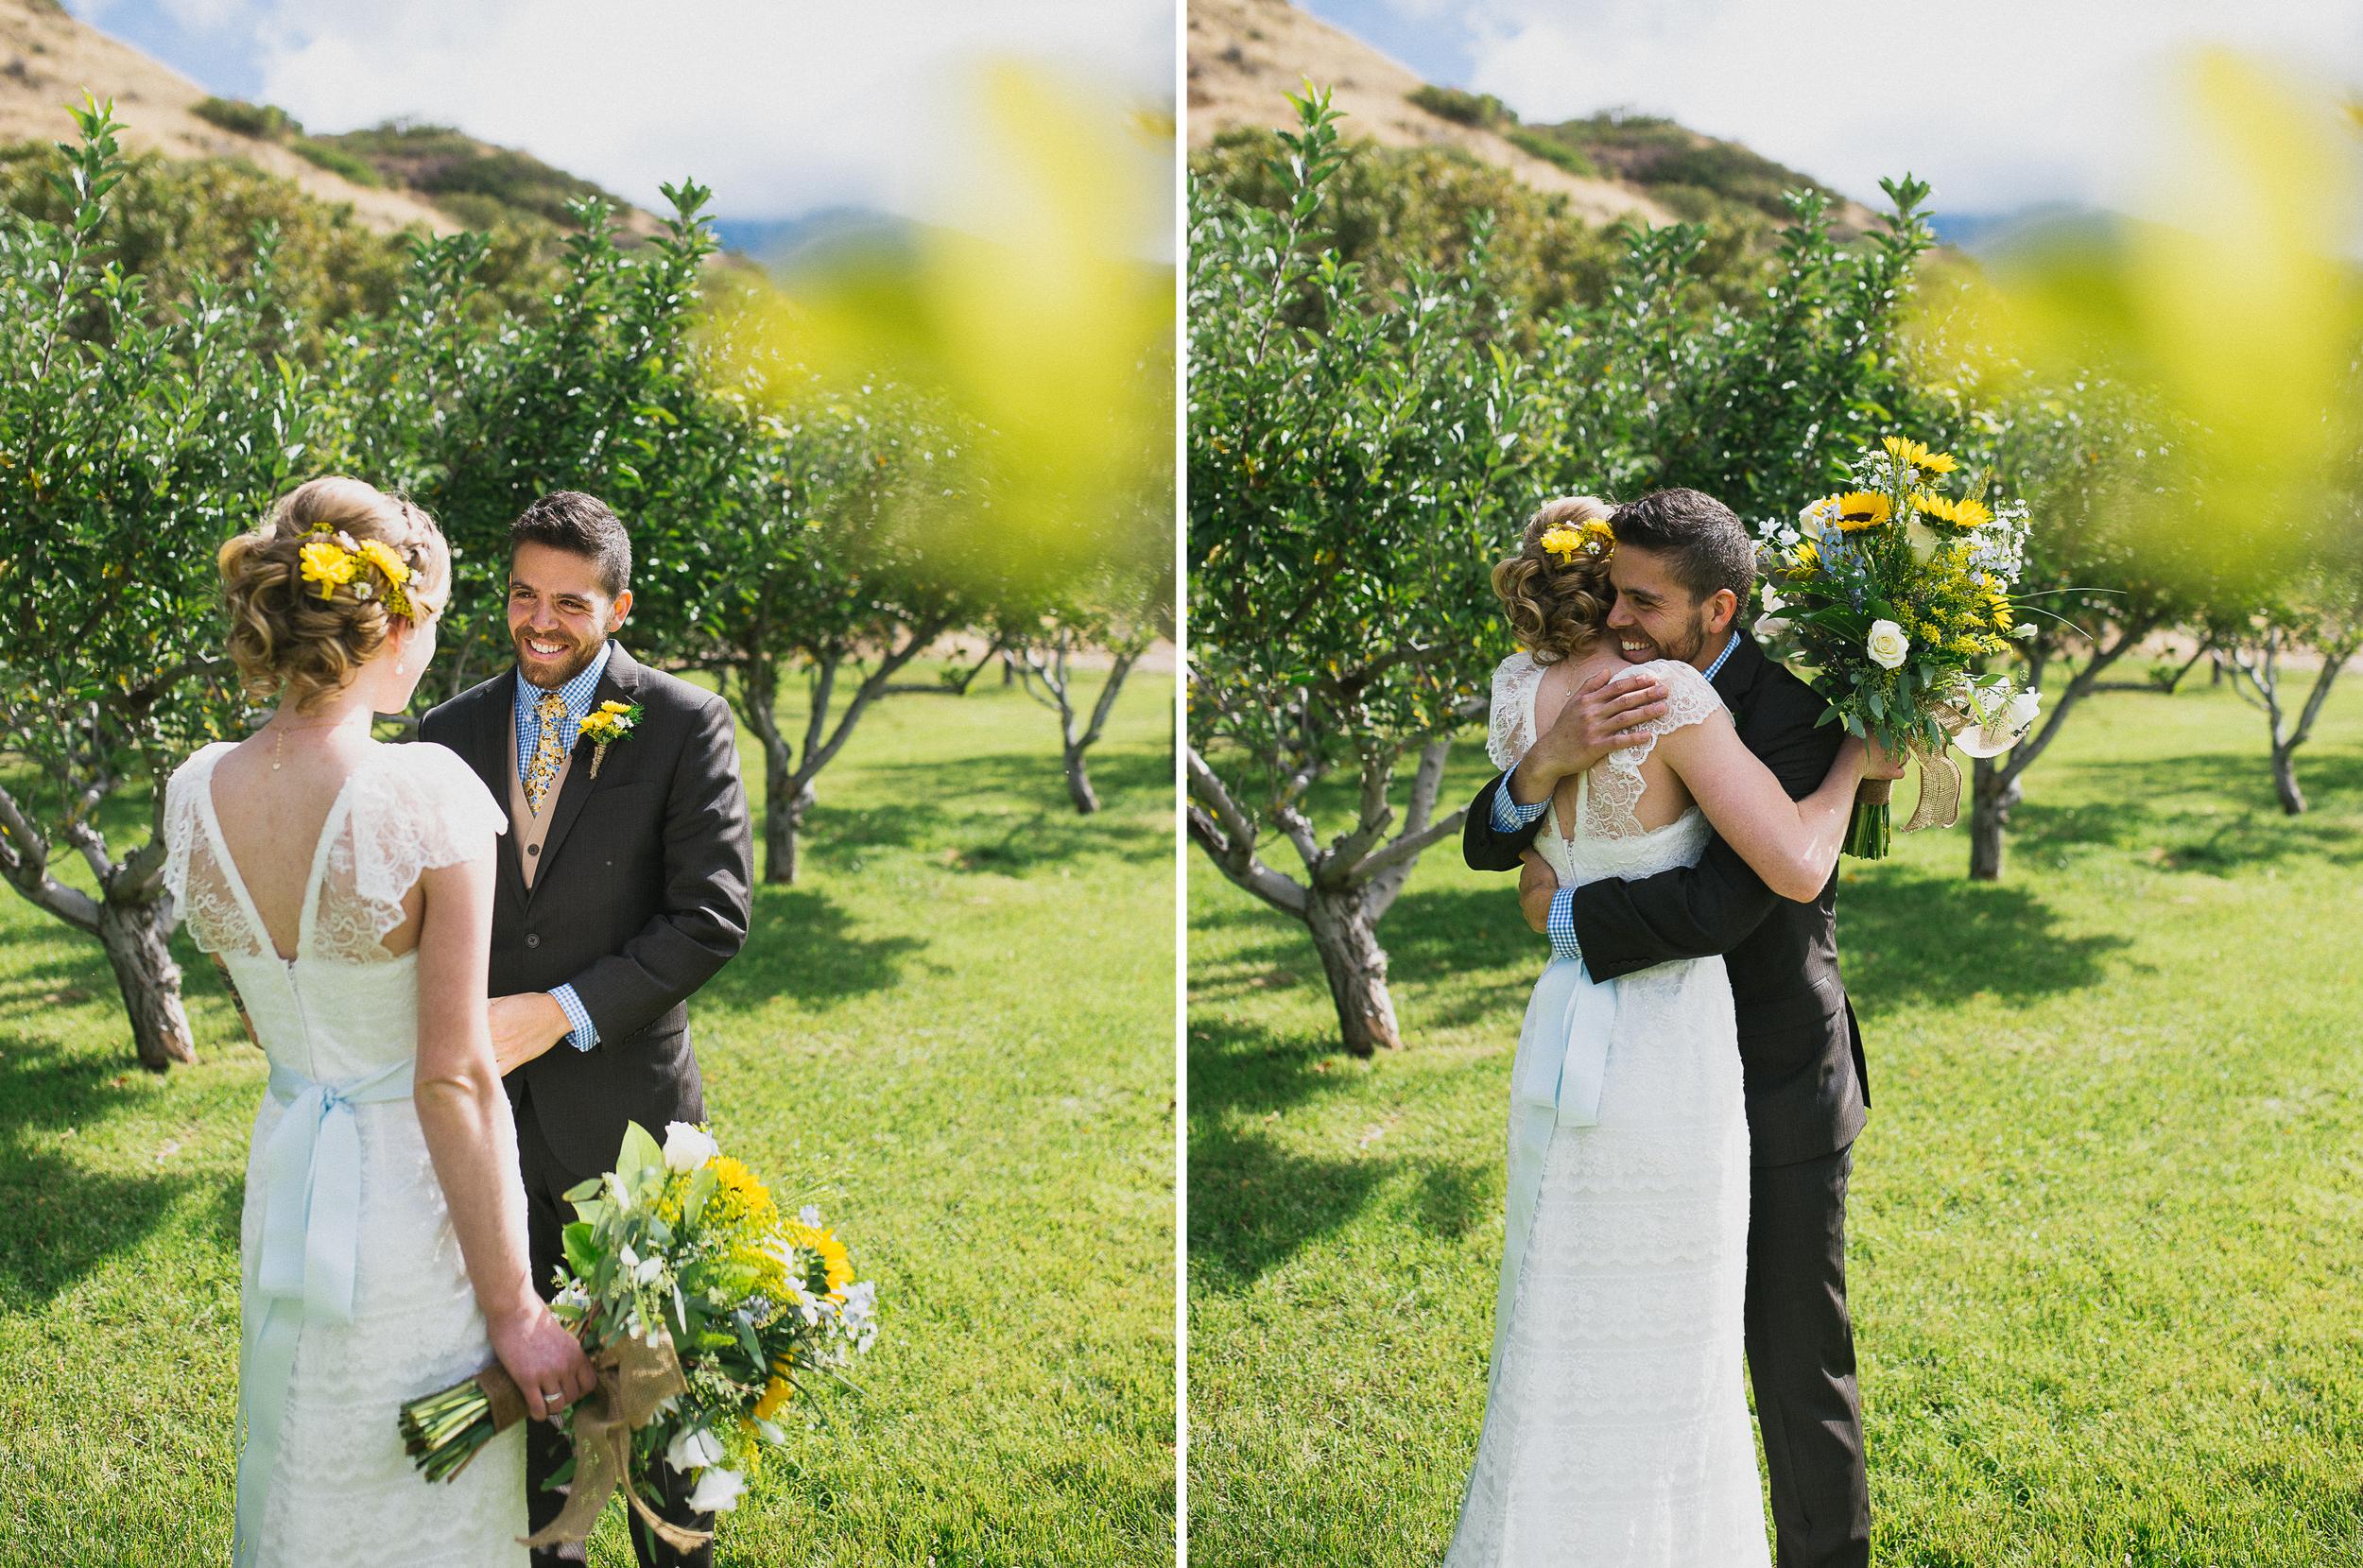 Salt-Lake-City-Wedding-Photographer-Utah-05.jpg